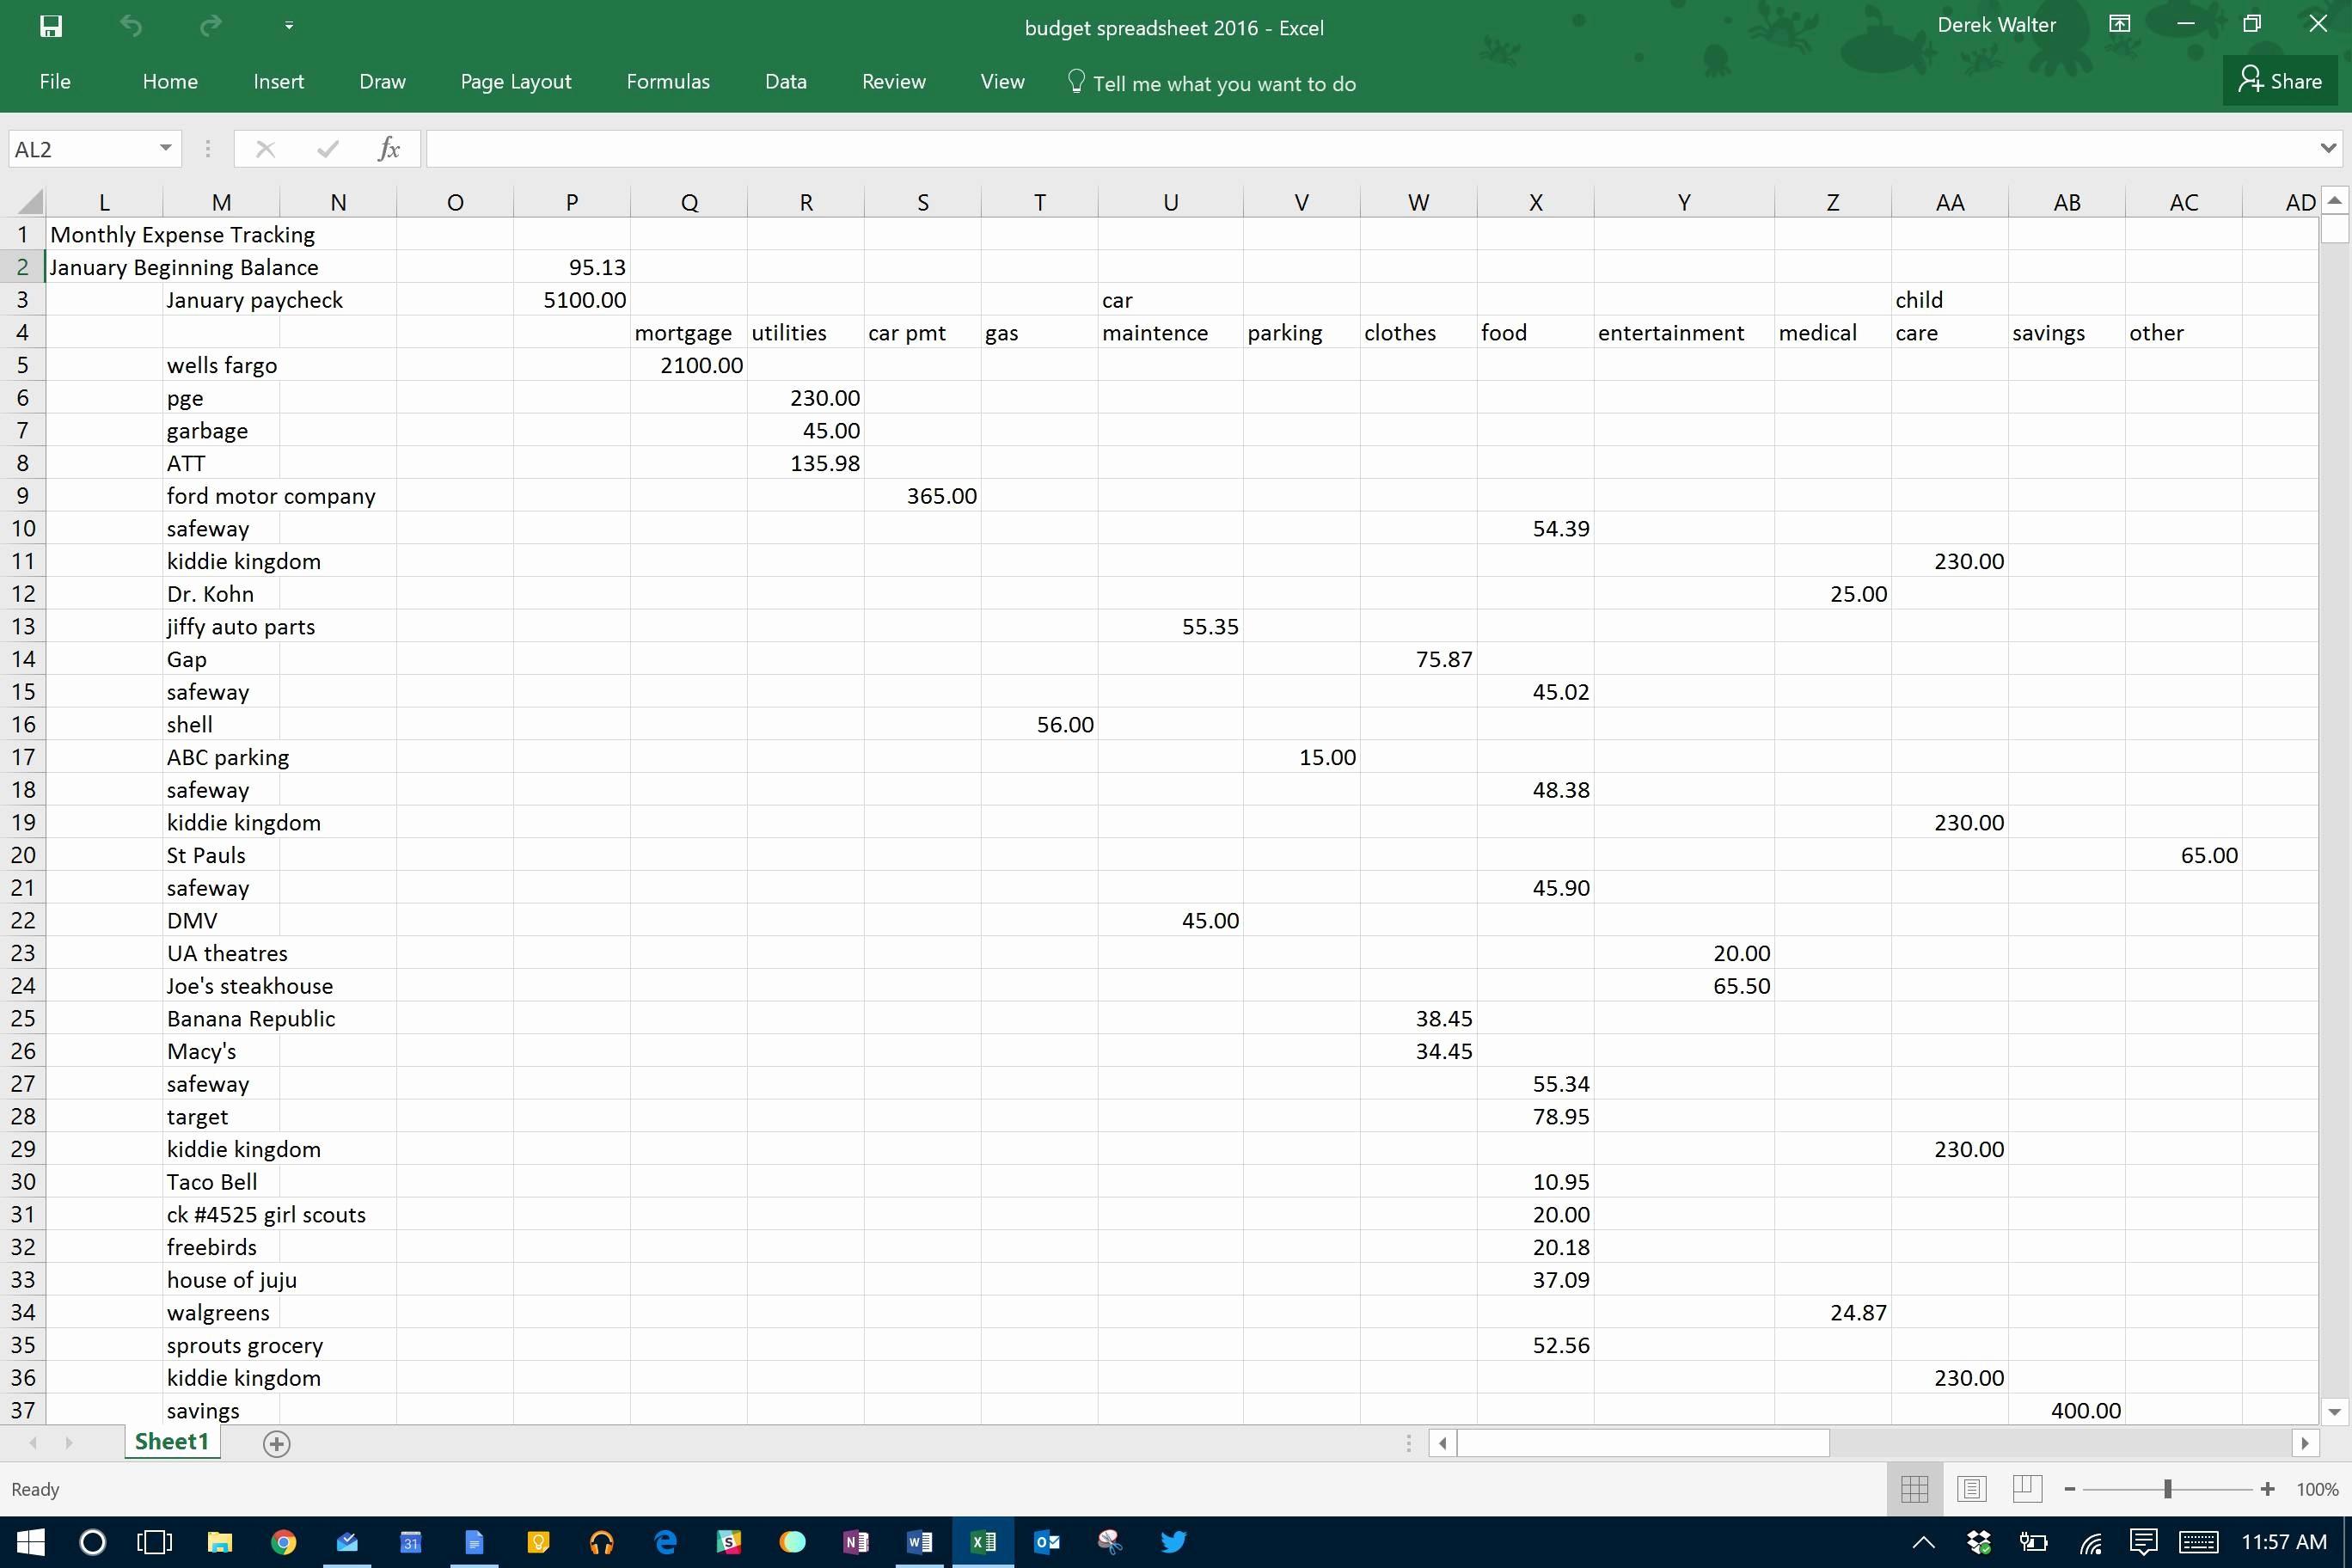 Itemized Deductions Worksheet For Small Business Elegant Spreadsheet Within Trucking Expenses Spreadsheet